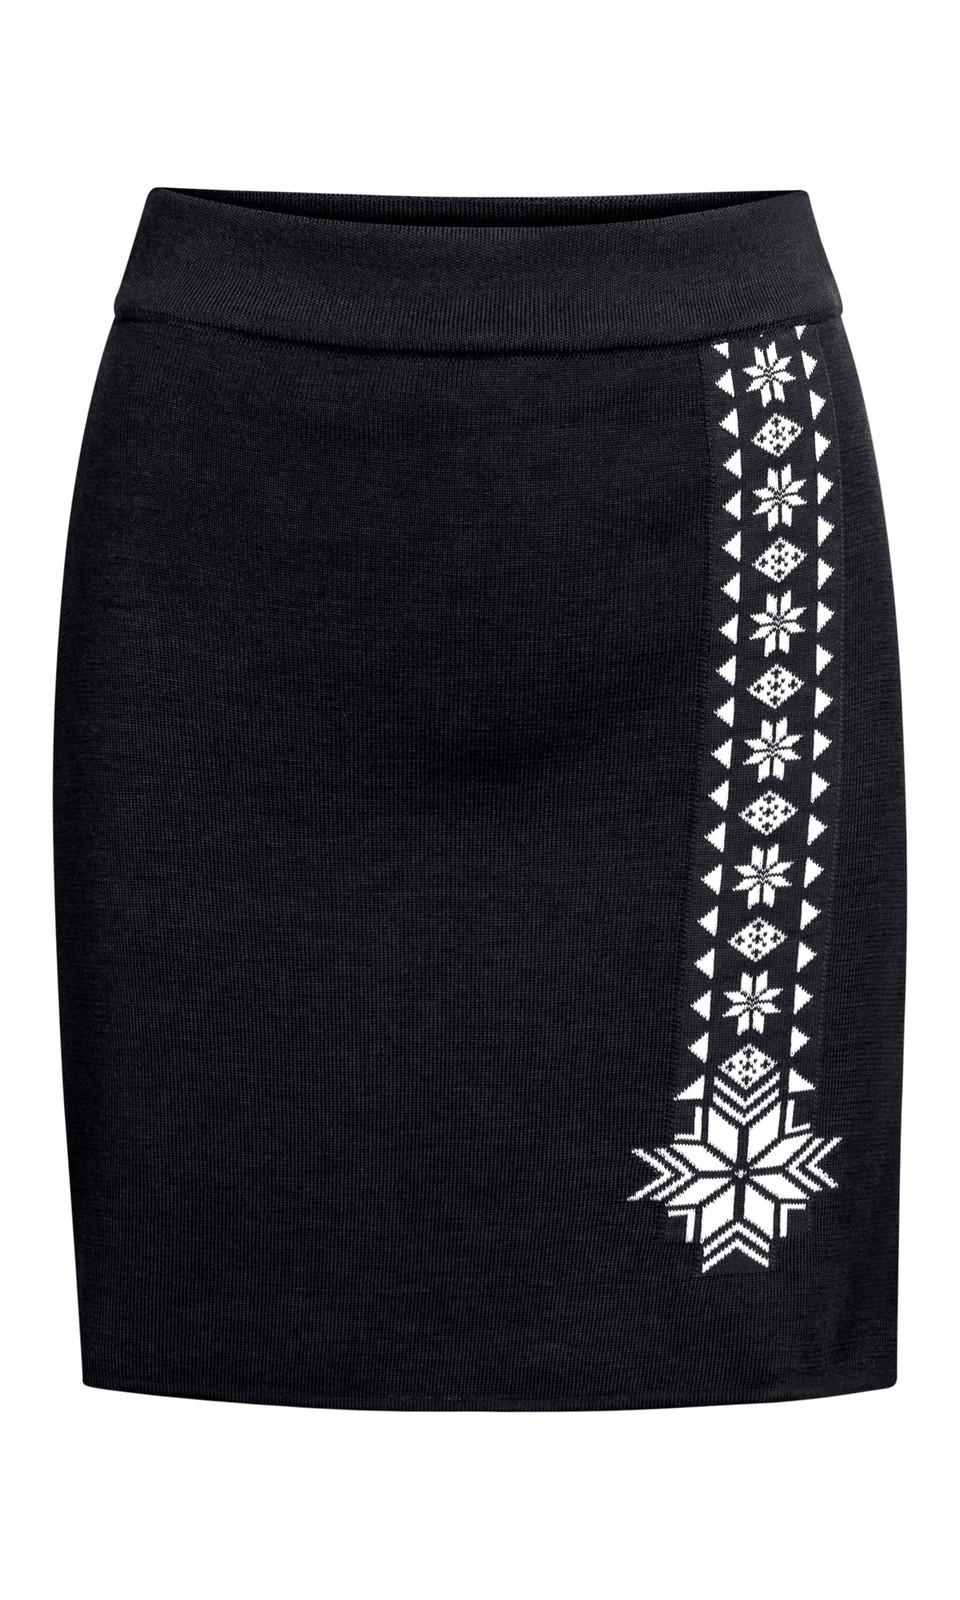 Dale of Norway Geilo Skirt, Ladies - Navy/Off White, 62041-C